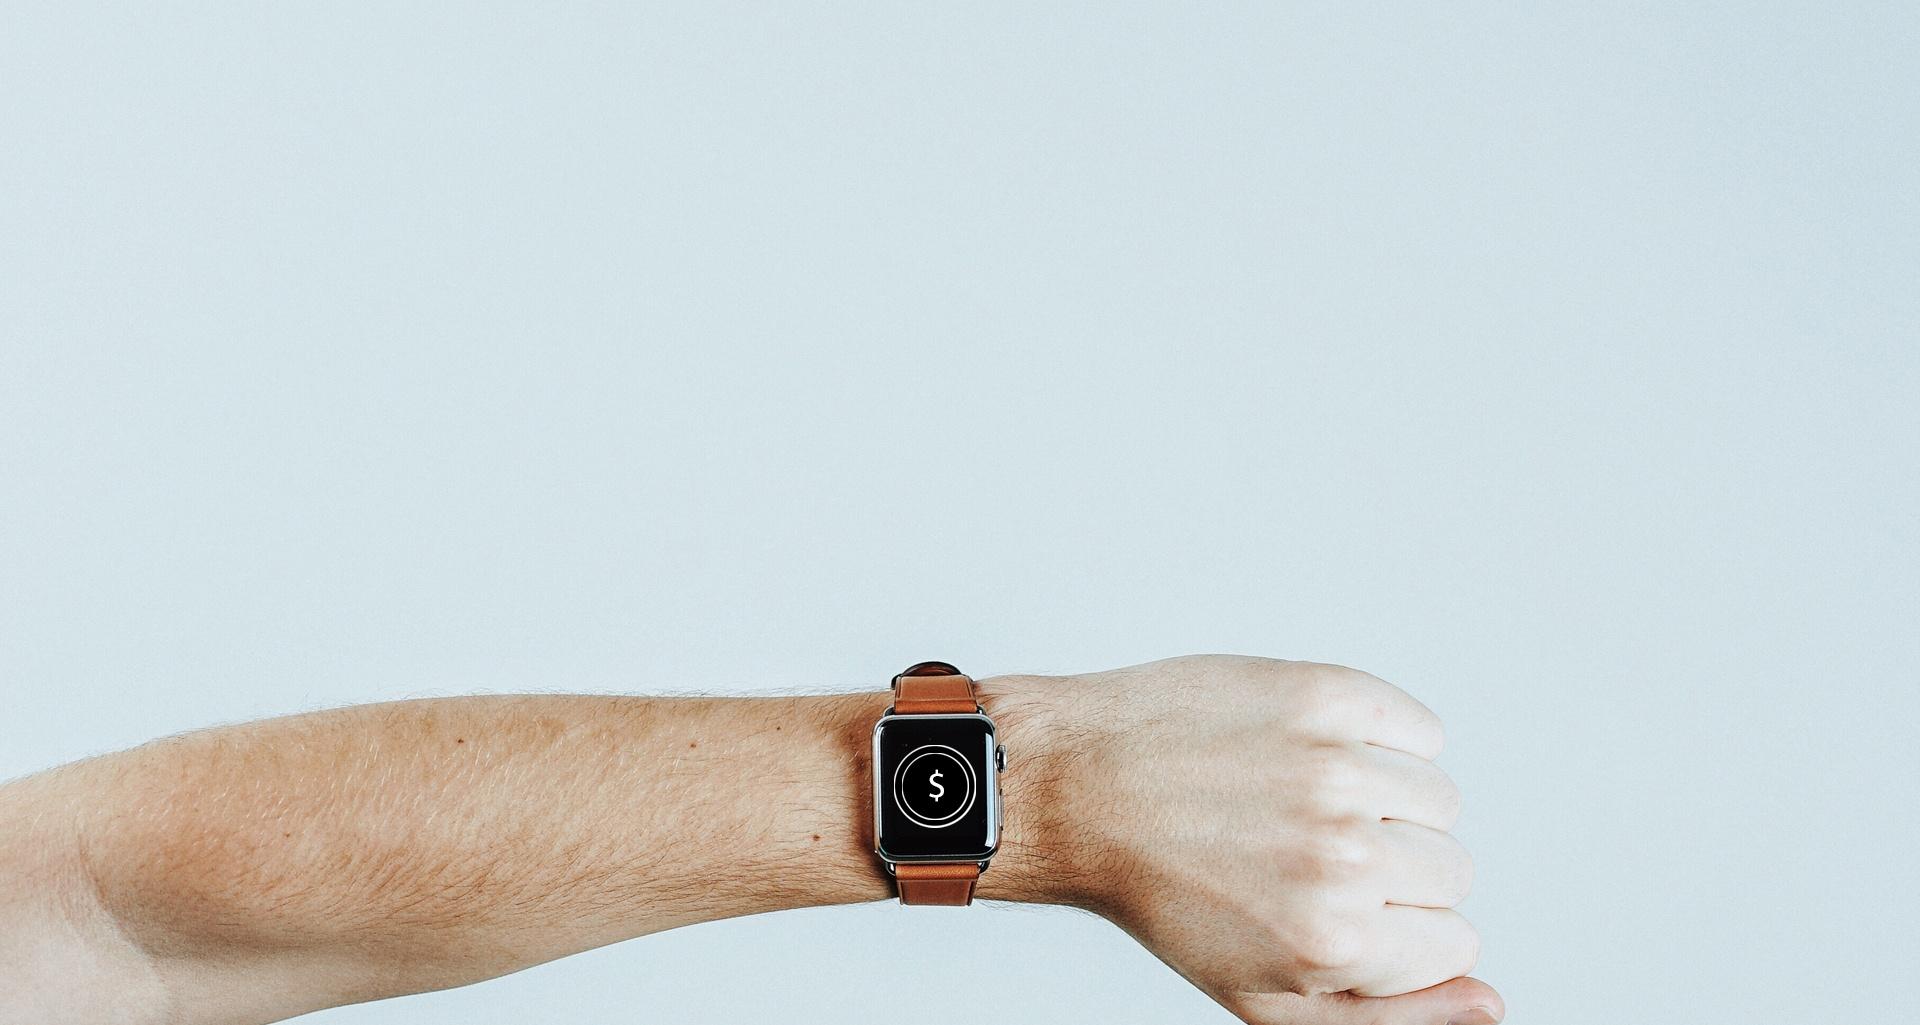 Main-Page-Image-Arm-Watch.jpg